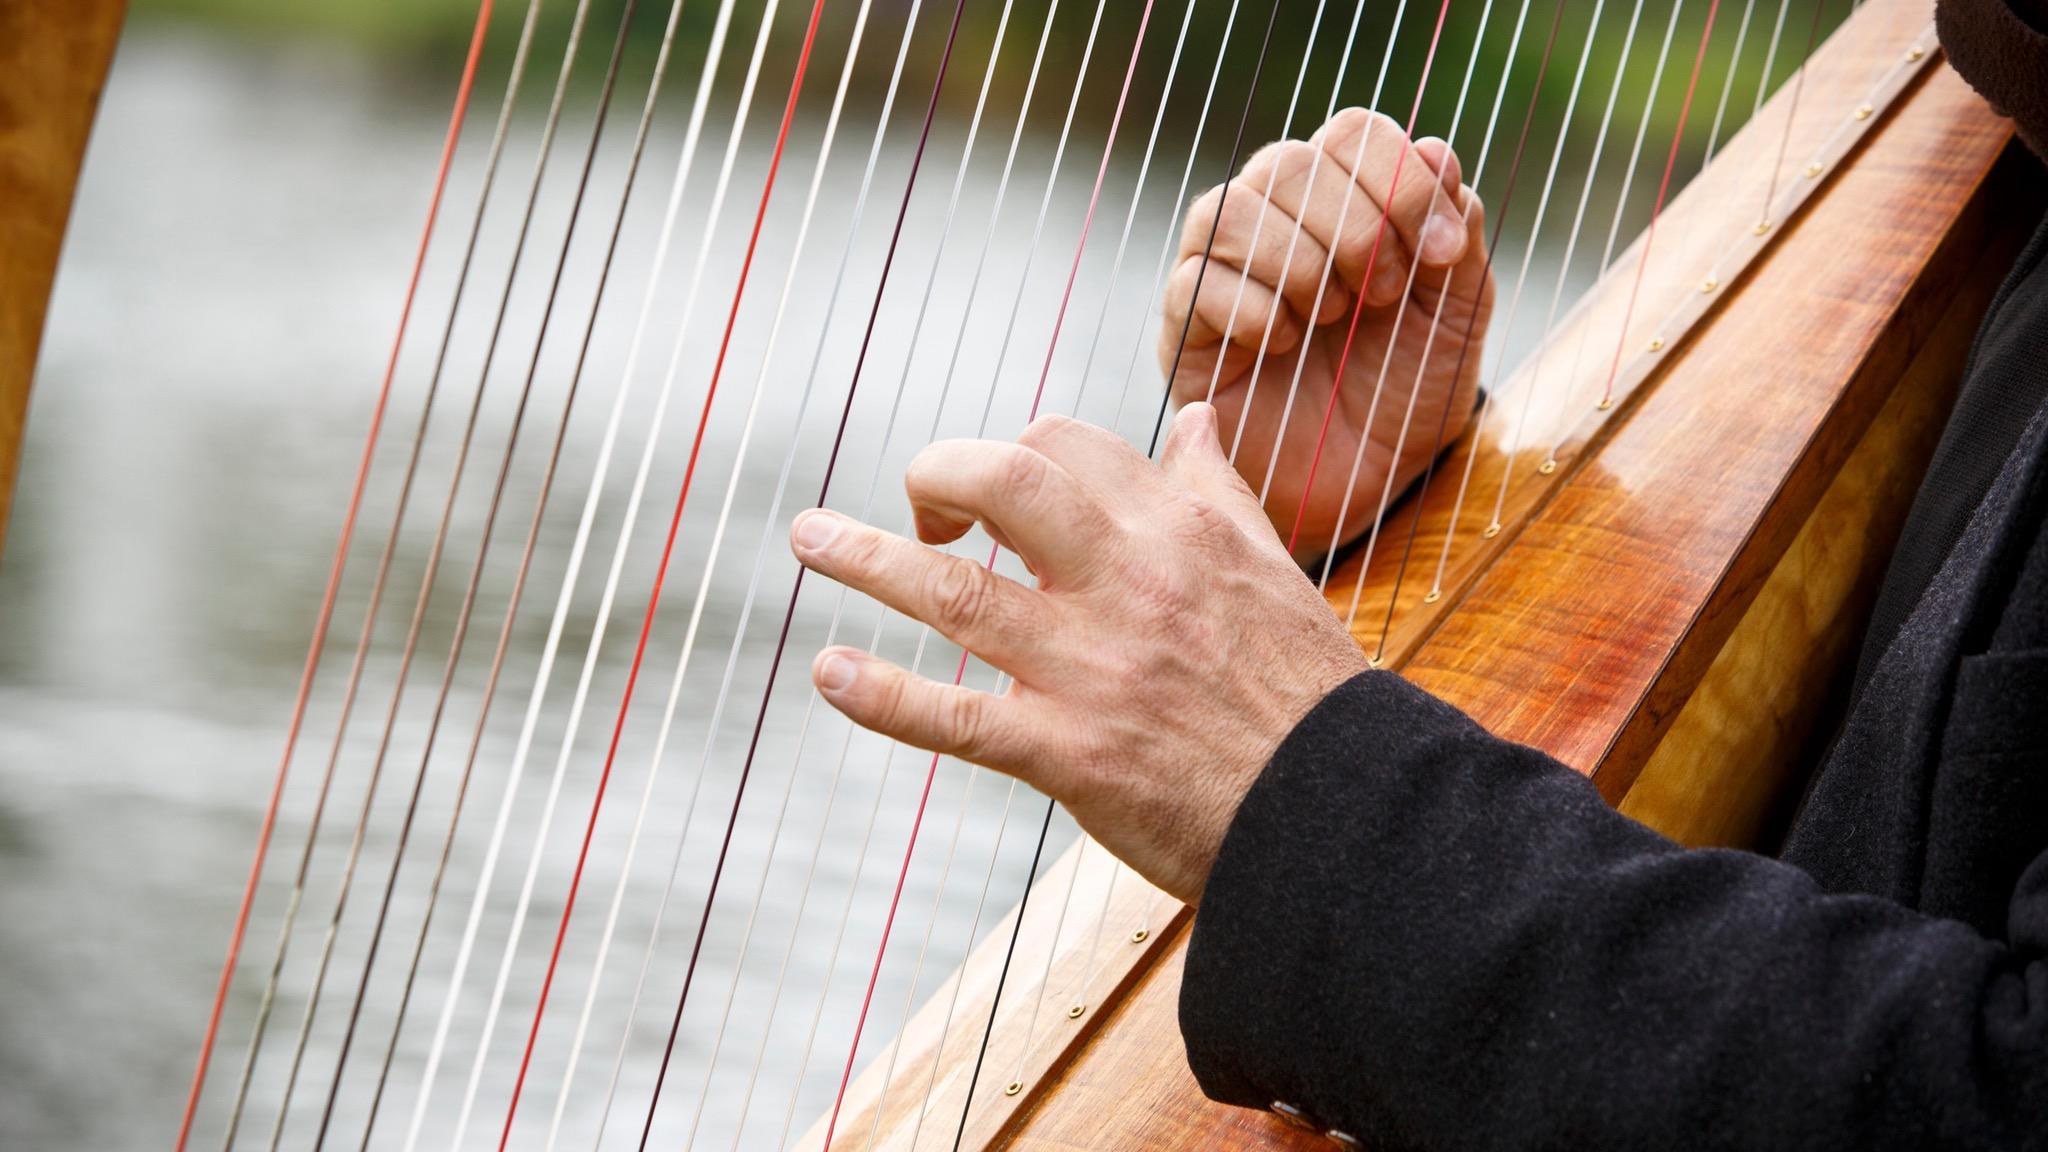 Michael Johnson playing the harp